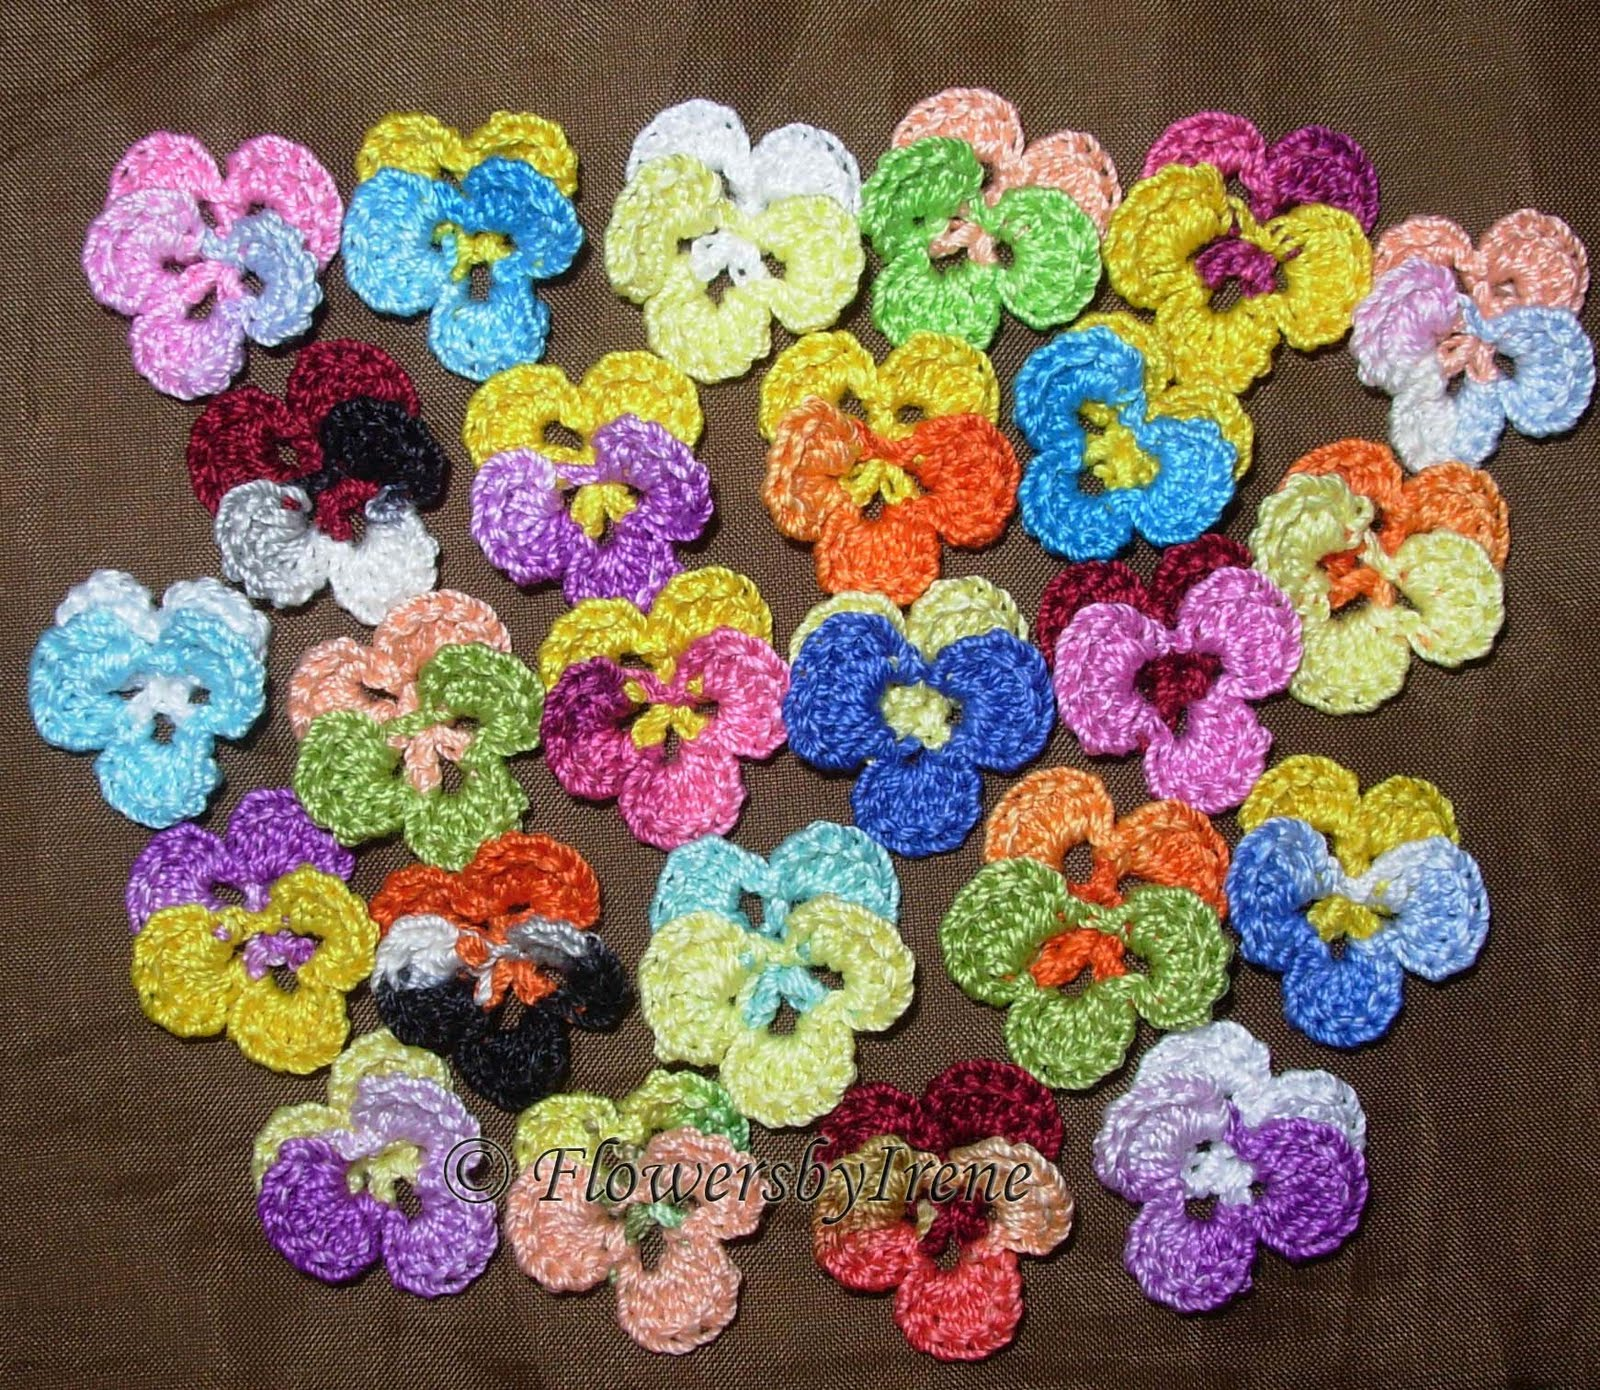 Crochet Flowers I love pansies